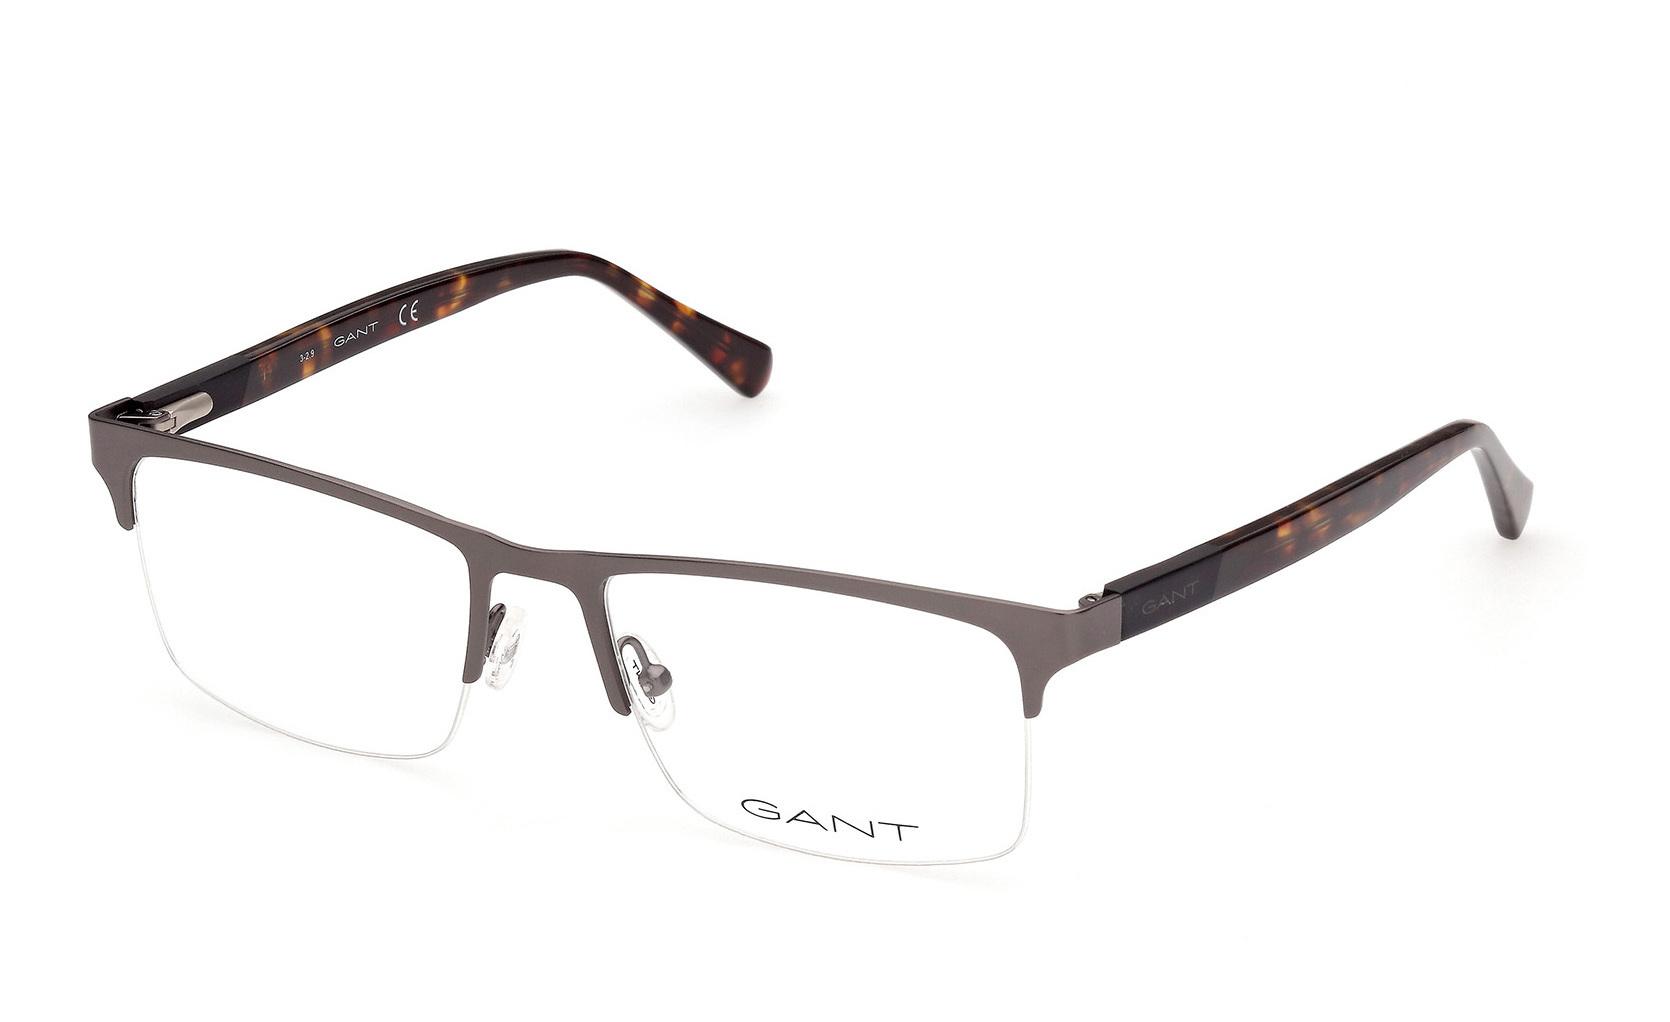 Gant Ga3210